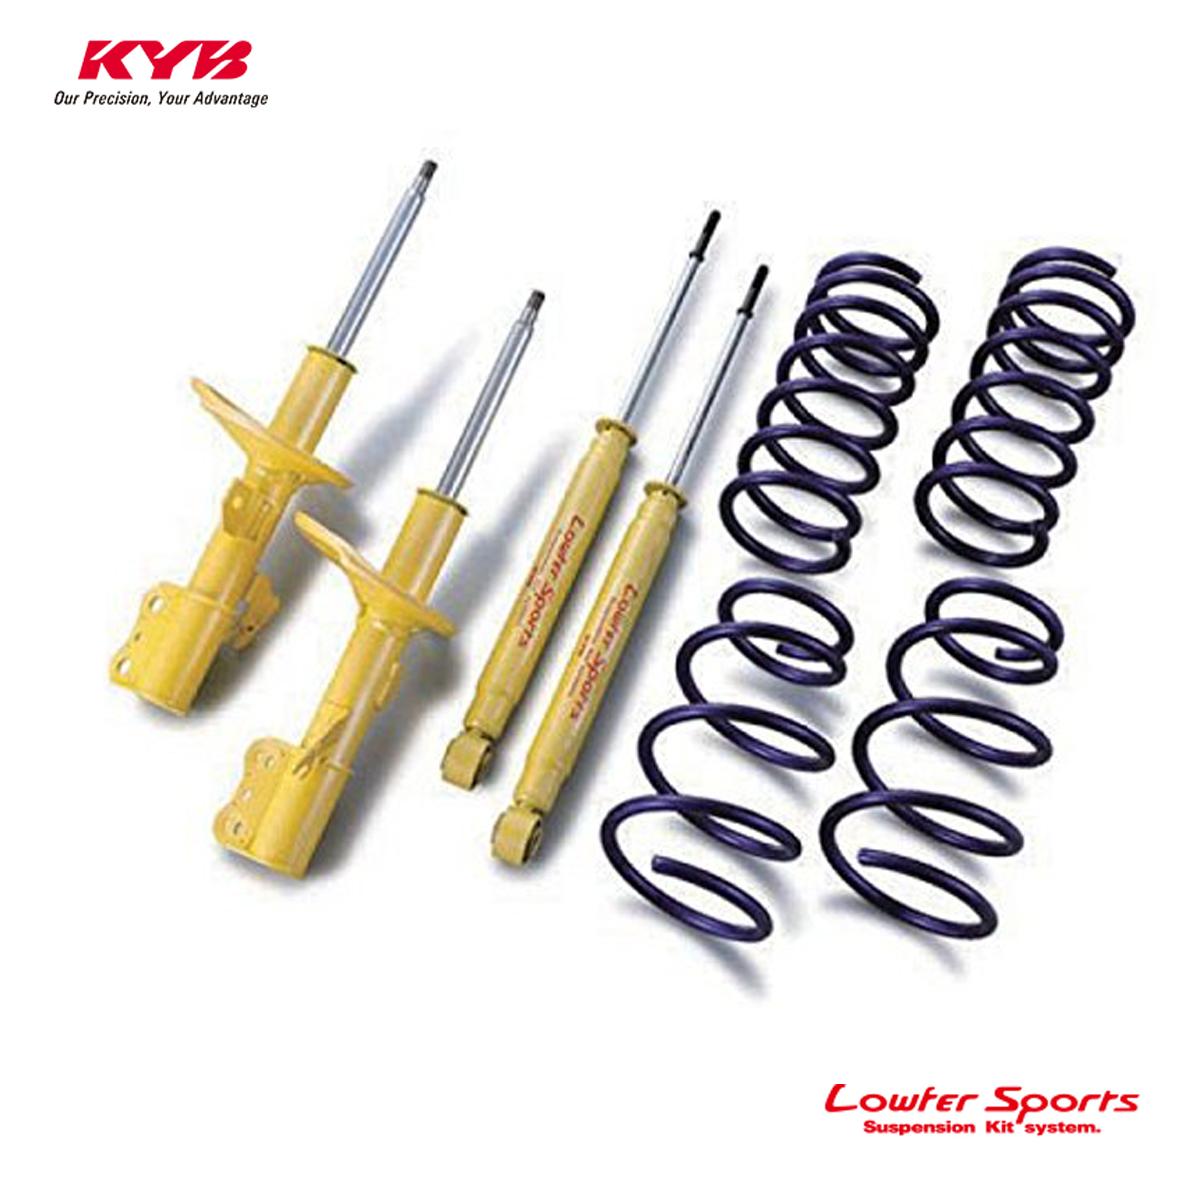 KYB カヤバ カローラアクシオ NKE165 ショックアブソーバー サスペンションキット 1台分 ローファースポーツ キット Lowfer Sports LKIT-NKE165